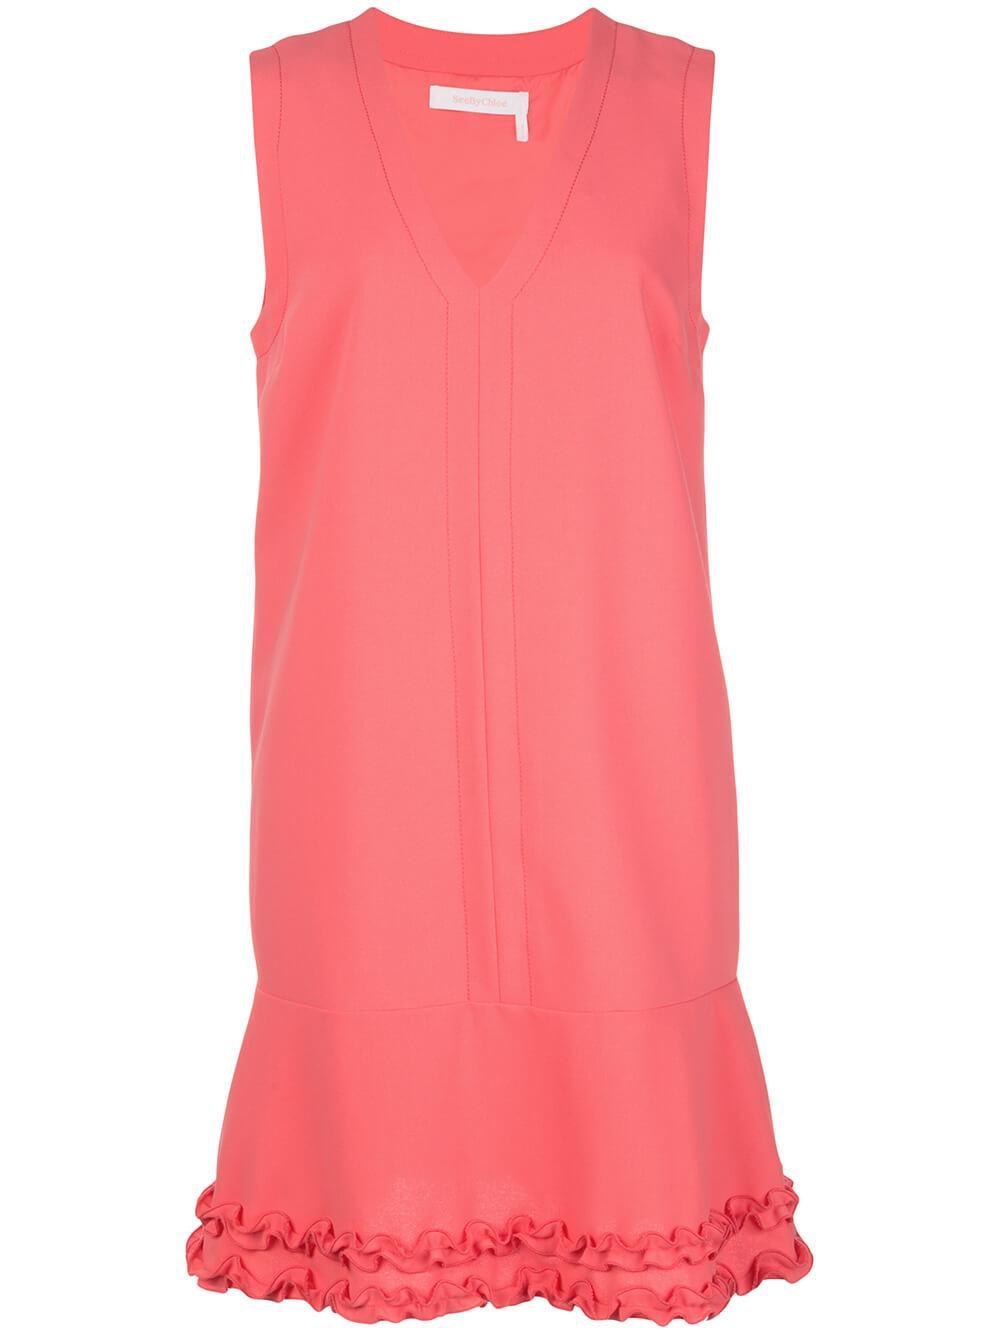 Sleeveless V Neck Crepe Dress Item # CHS20SRO41012